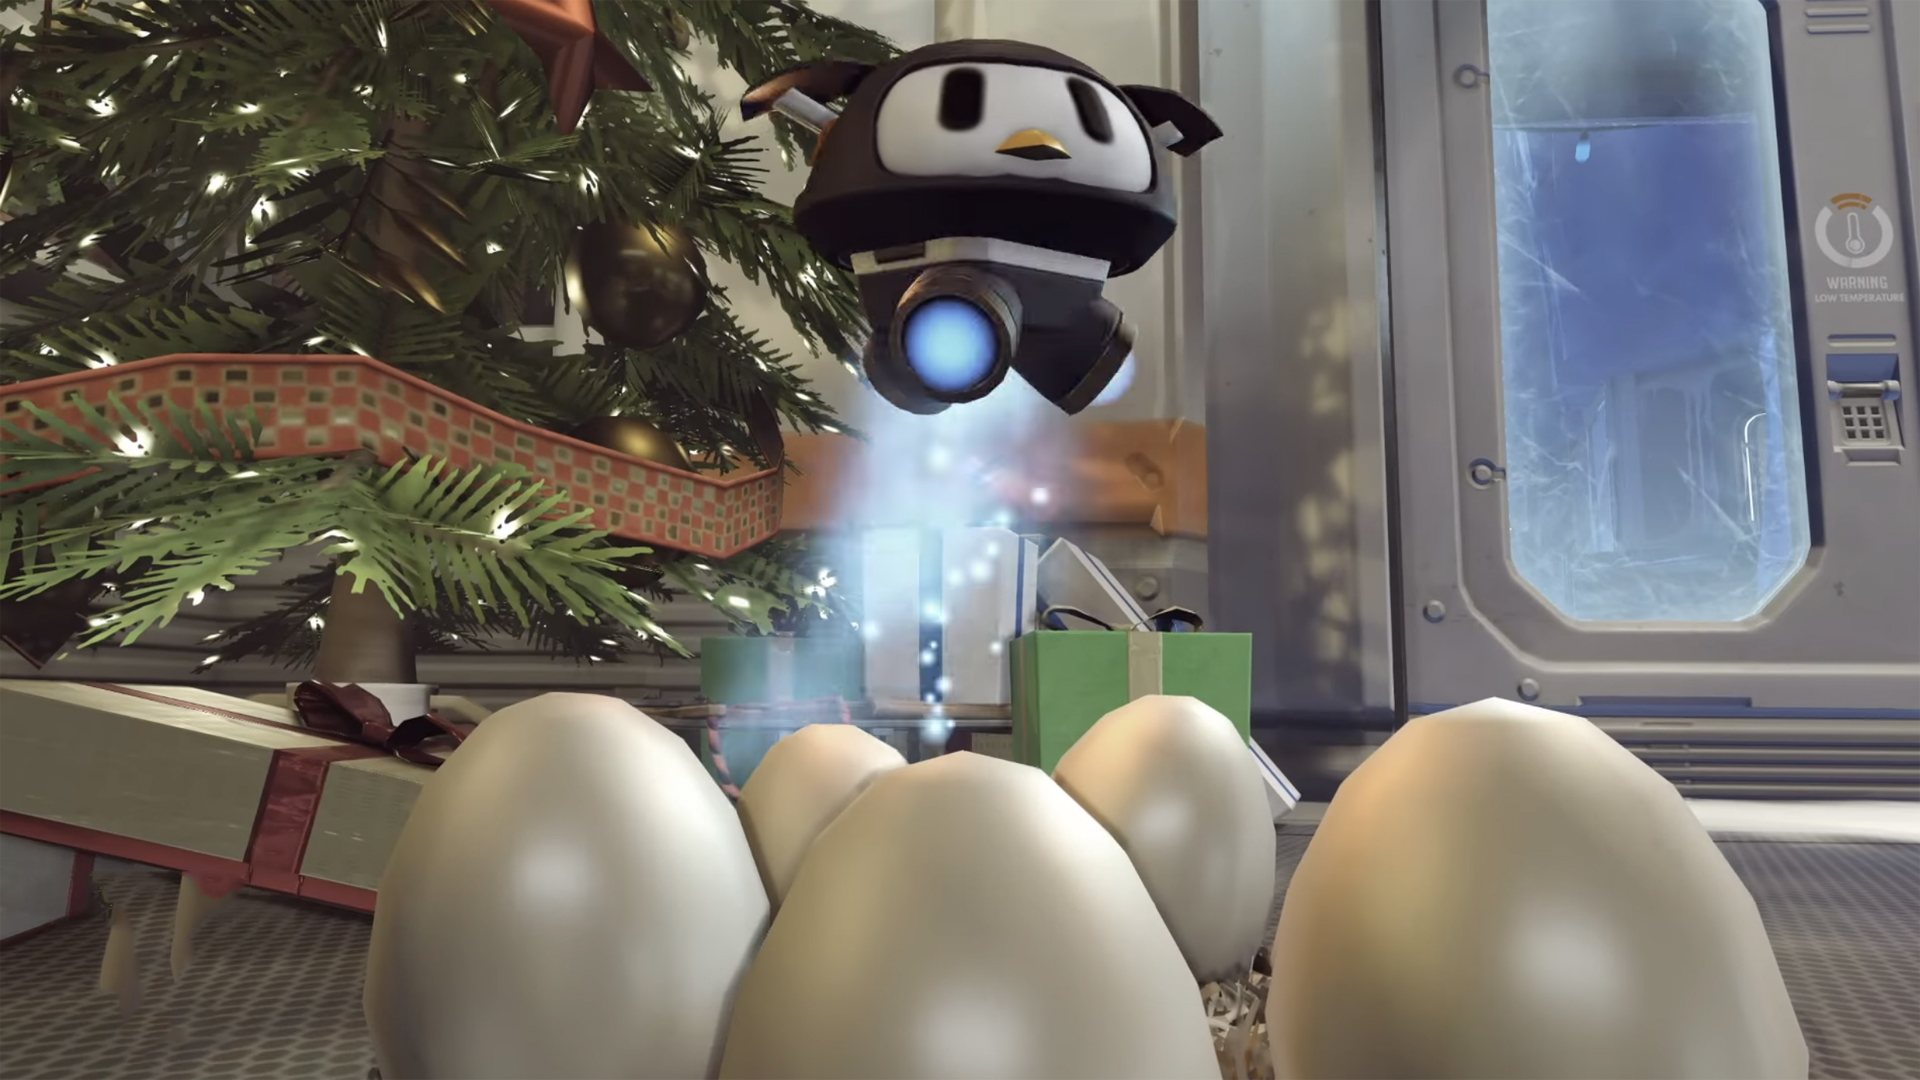 Overwatch Christmas Skins 2021 Leak Overwatch Winter Wonderland 2020 Begins December 15 Gamesradar